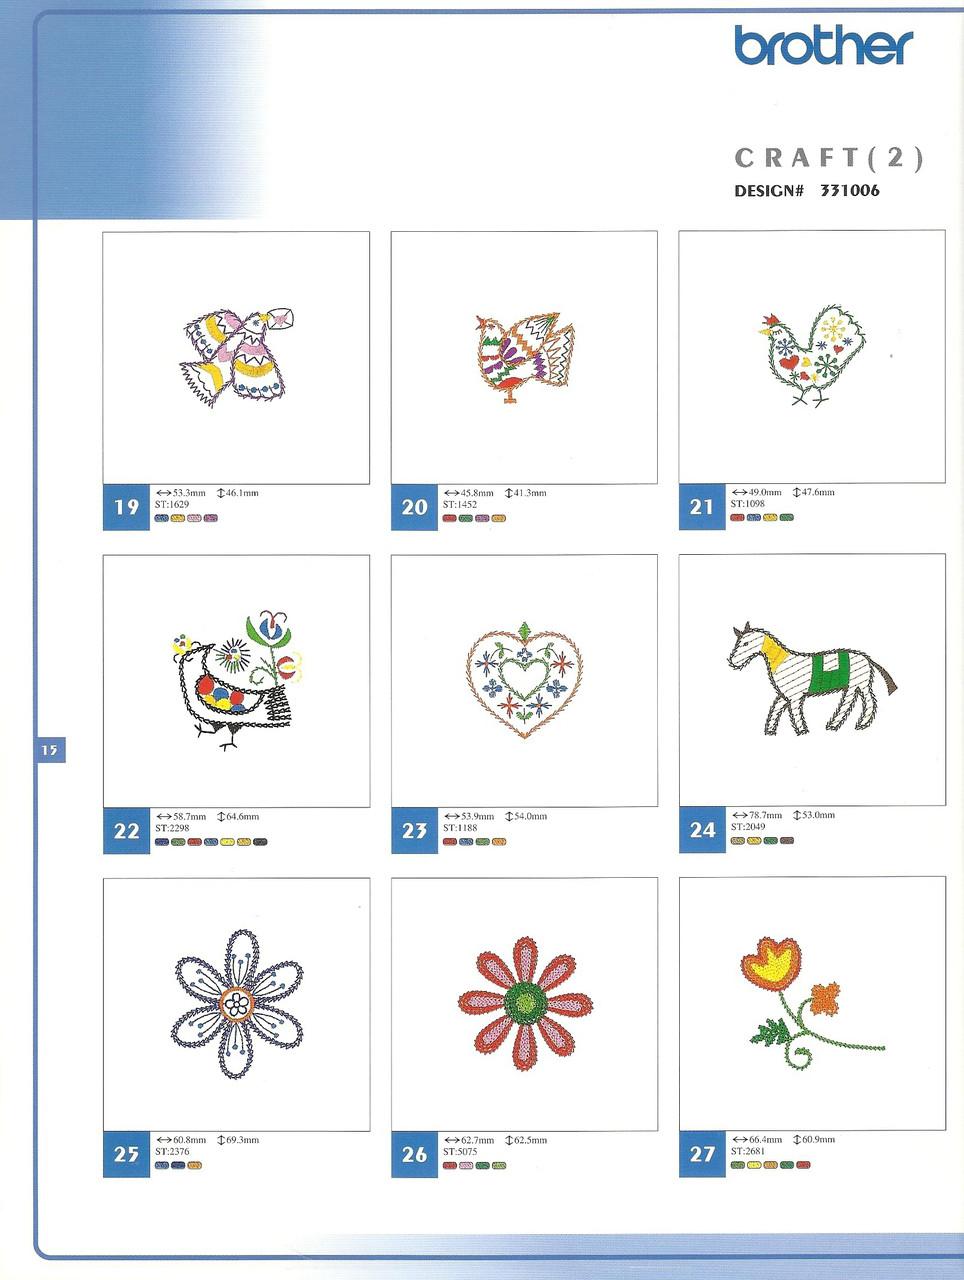 331006 Crafts II-4